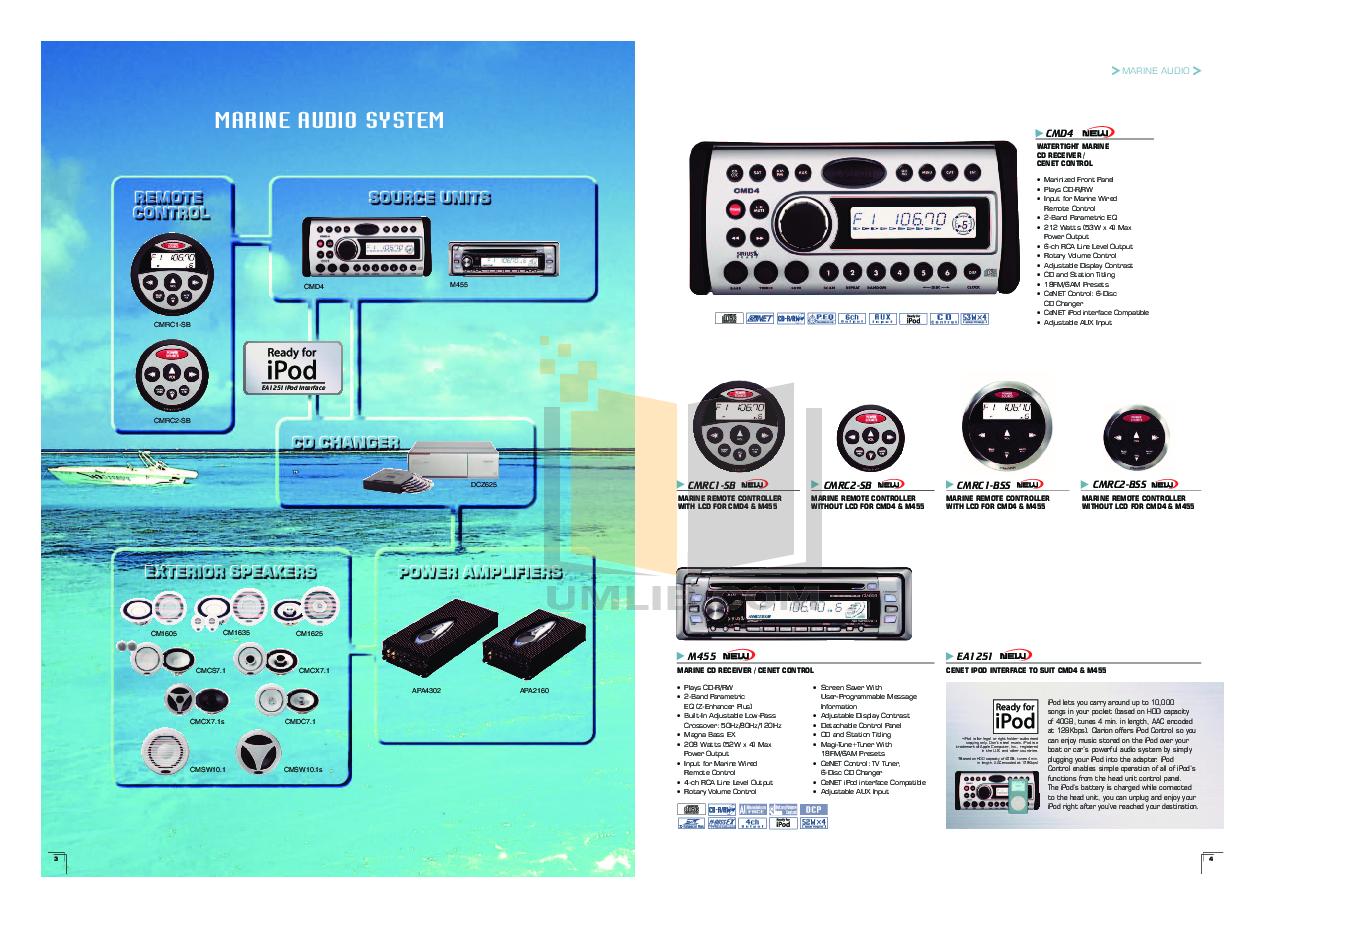 clarion marine m455 manual free owners manual u2022 rh wordworksbysea com Clarion Marine Radio Remote Marine Audio